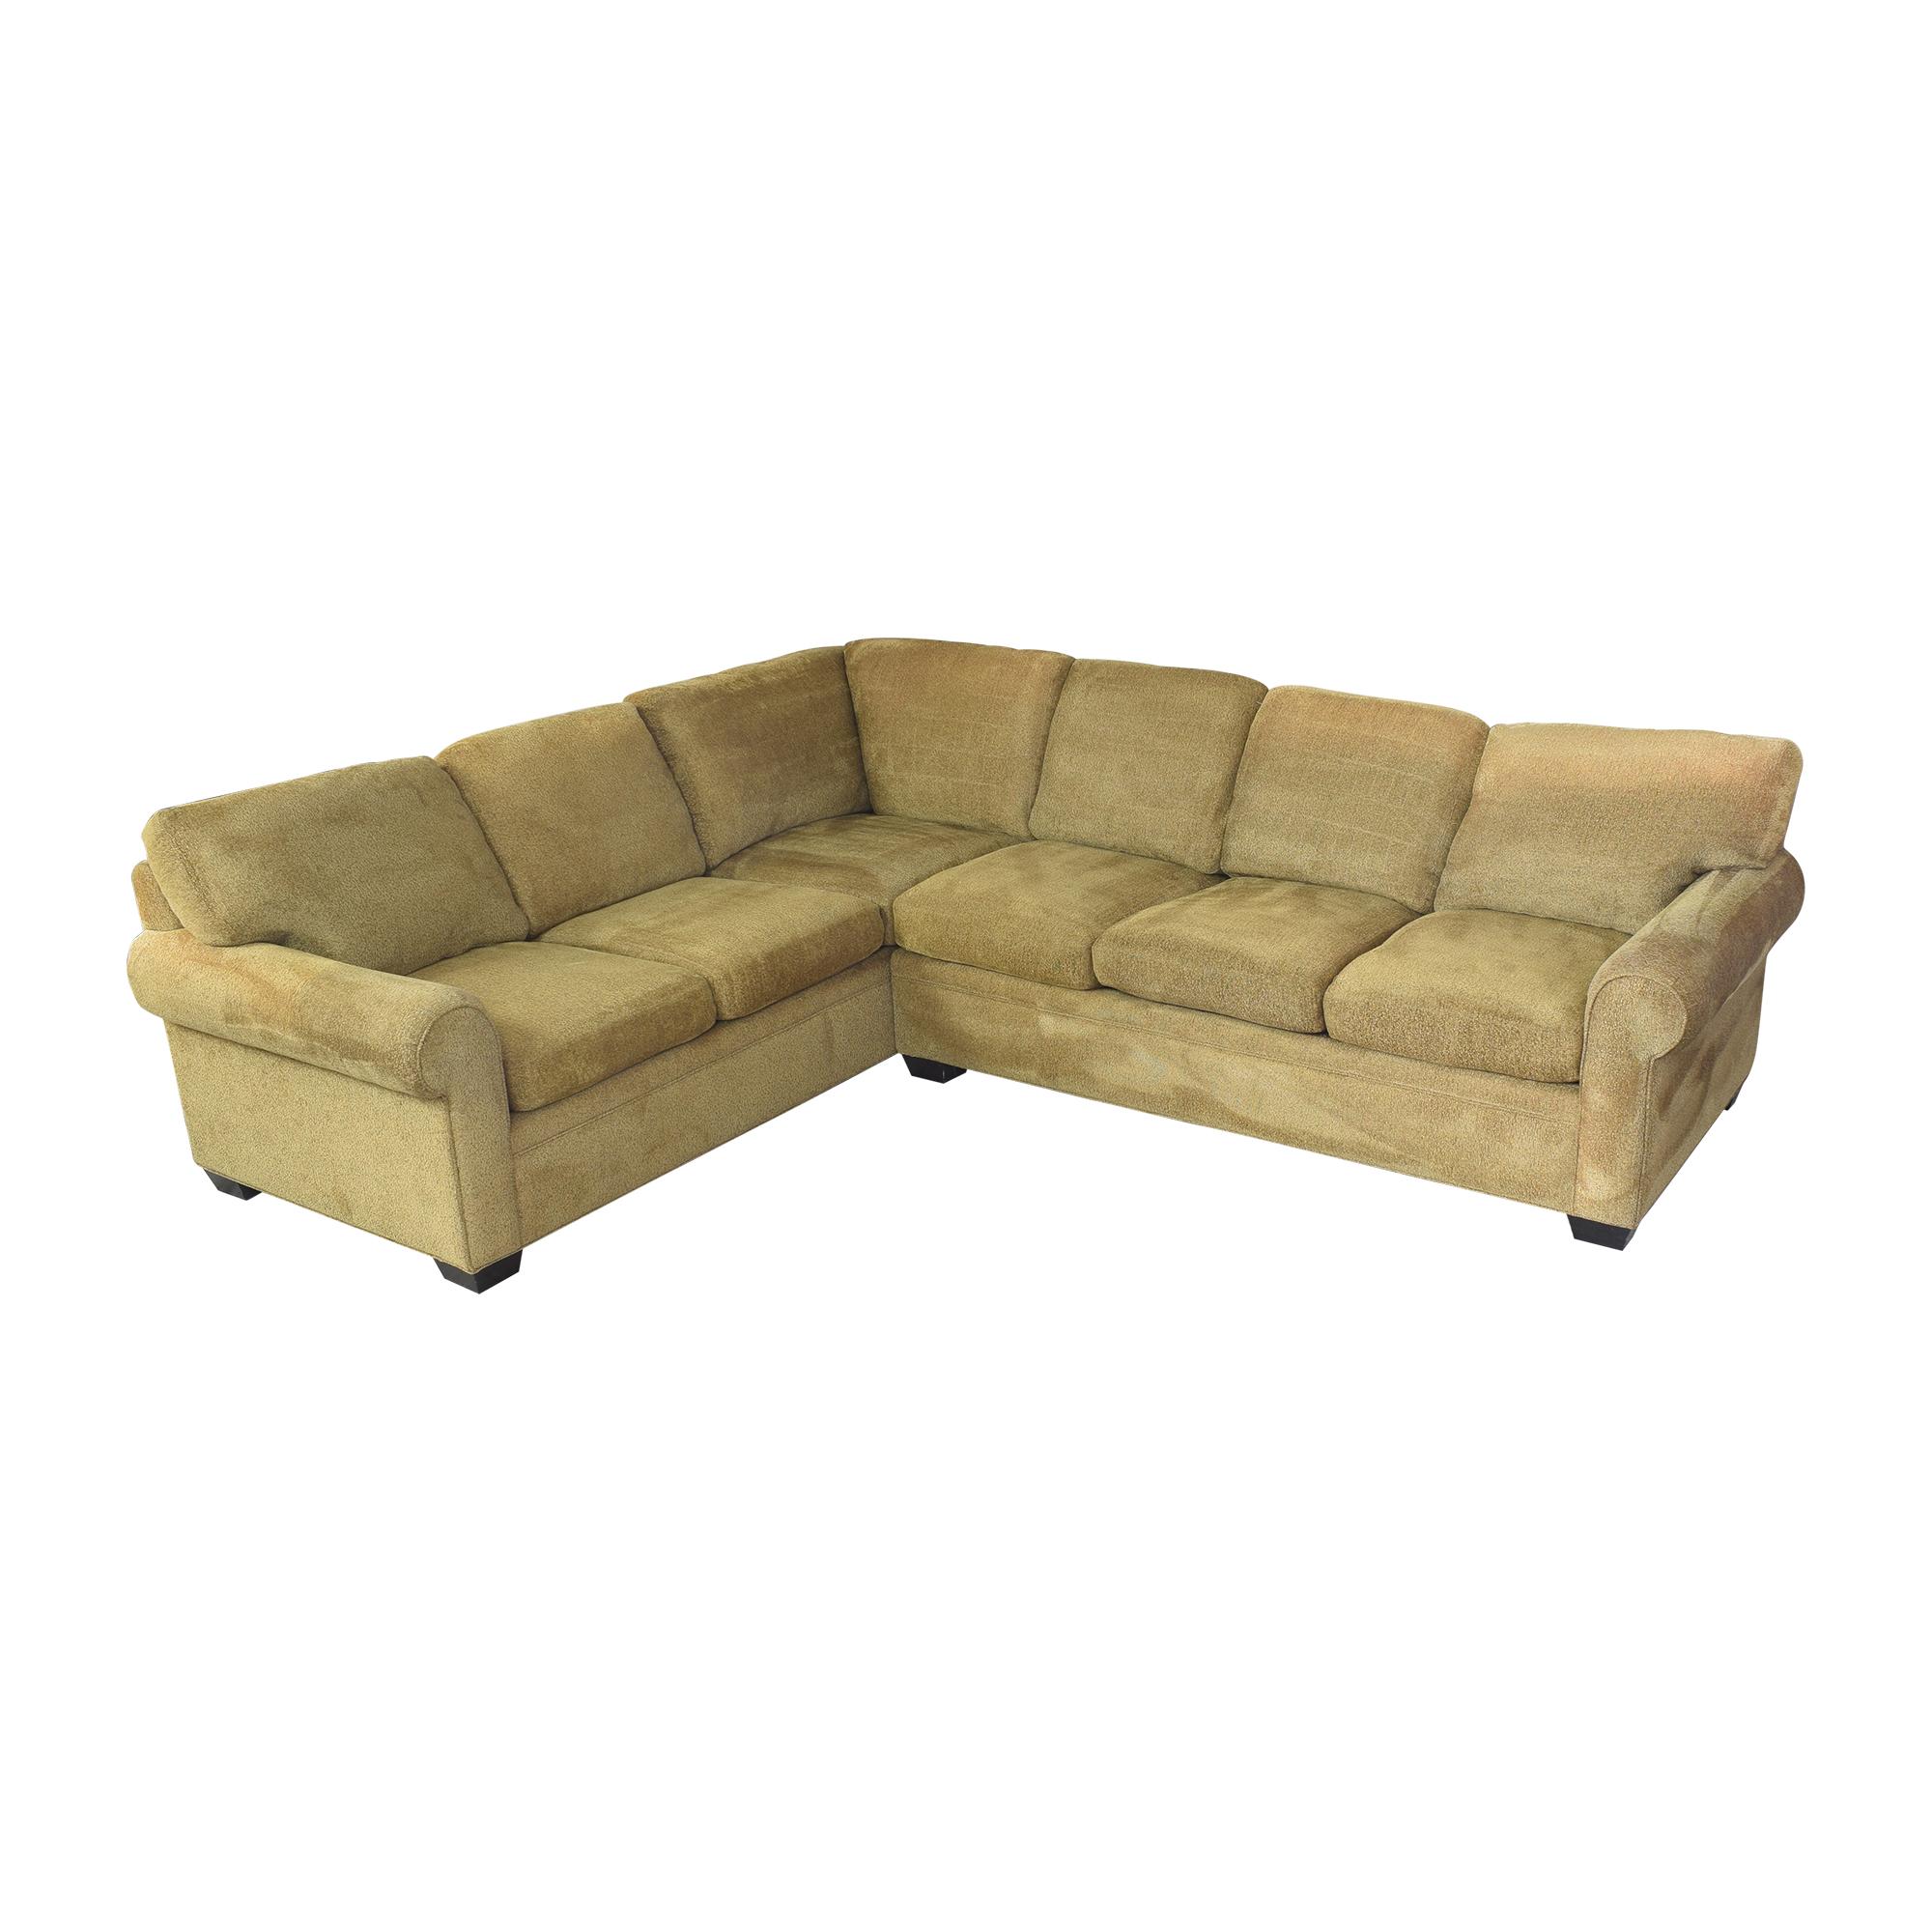 Drexel Heritage Drexel Heritage Corner Sectional Sofa price